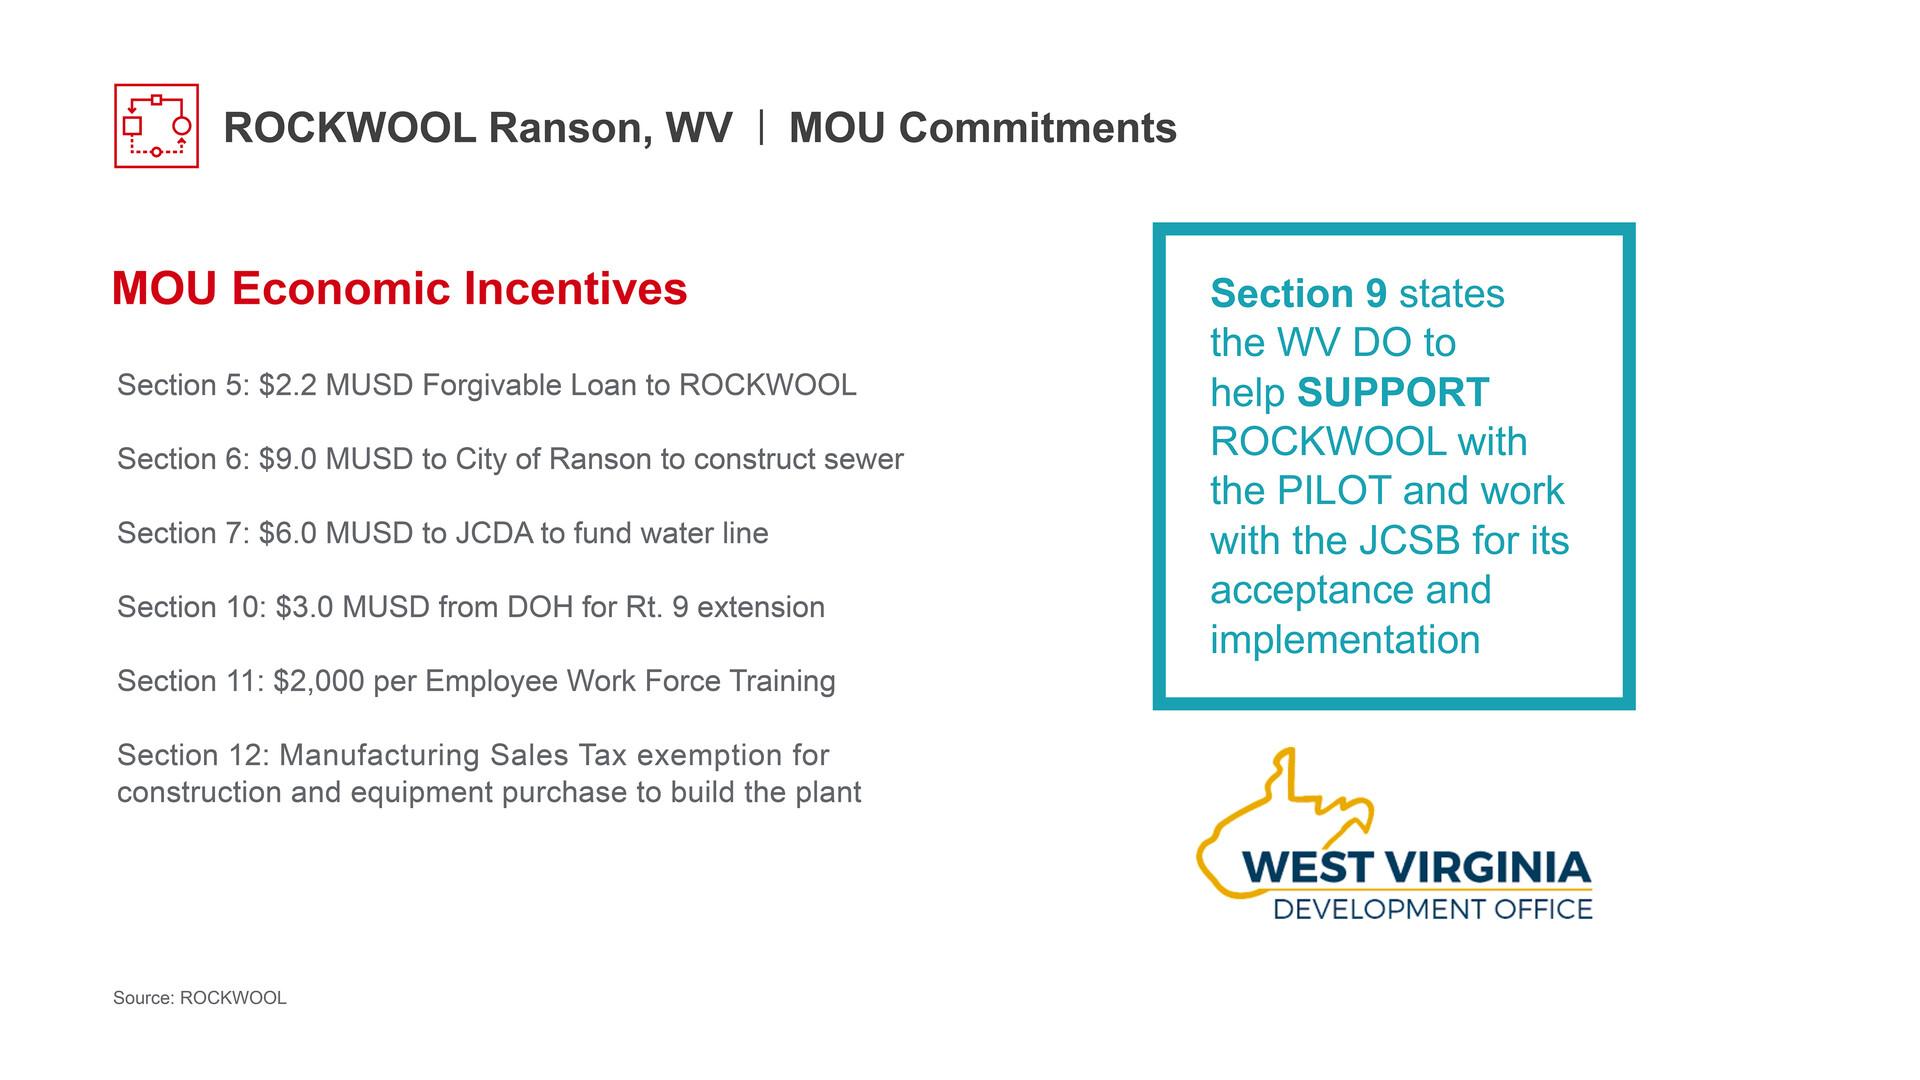 ROCKWOOL Ranson, Jefferson County, WV memorandum of understanding (MoU) economic incentives.